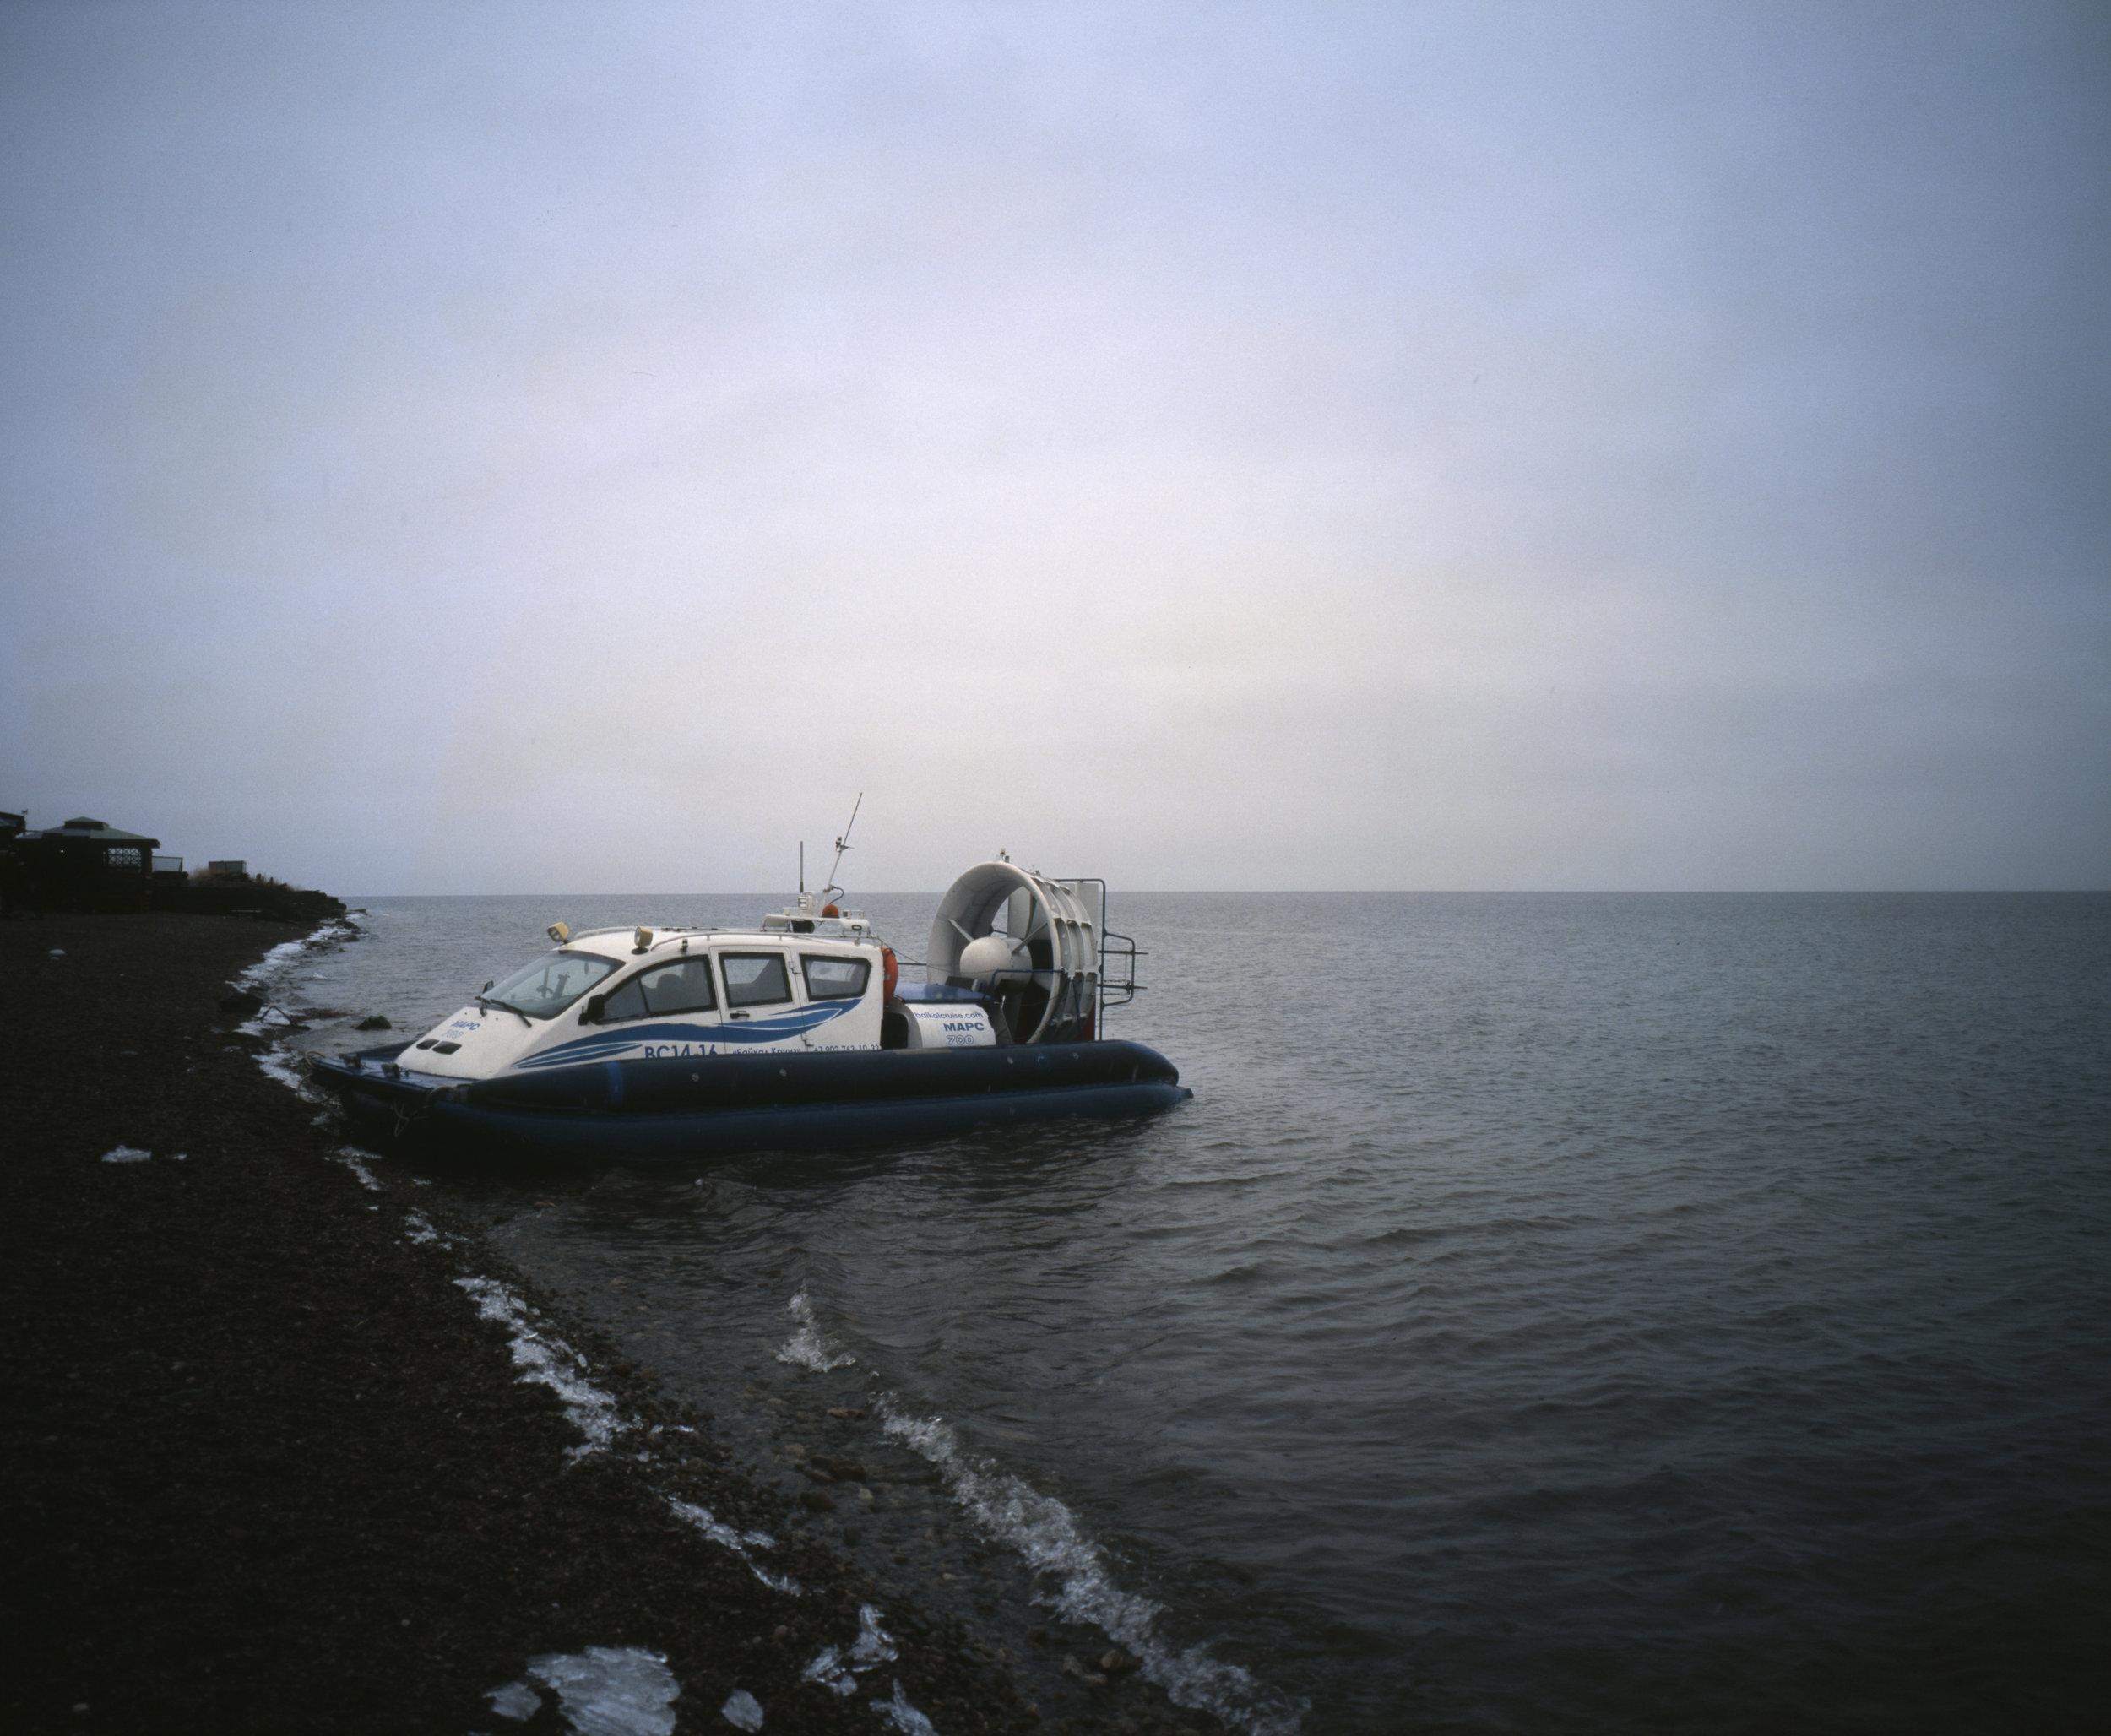 Hovercraft of the lake Fuji GF670w   Kodak E100gx